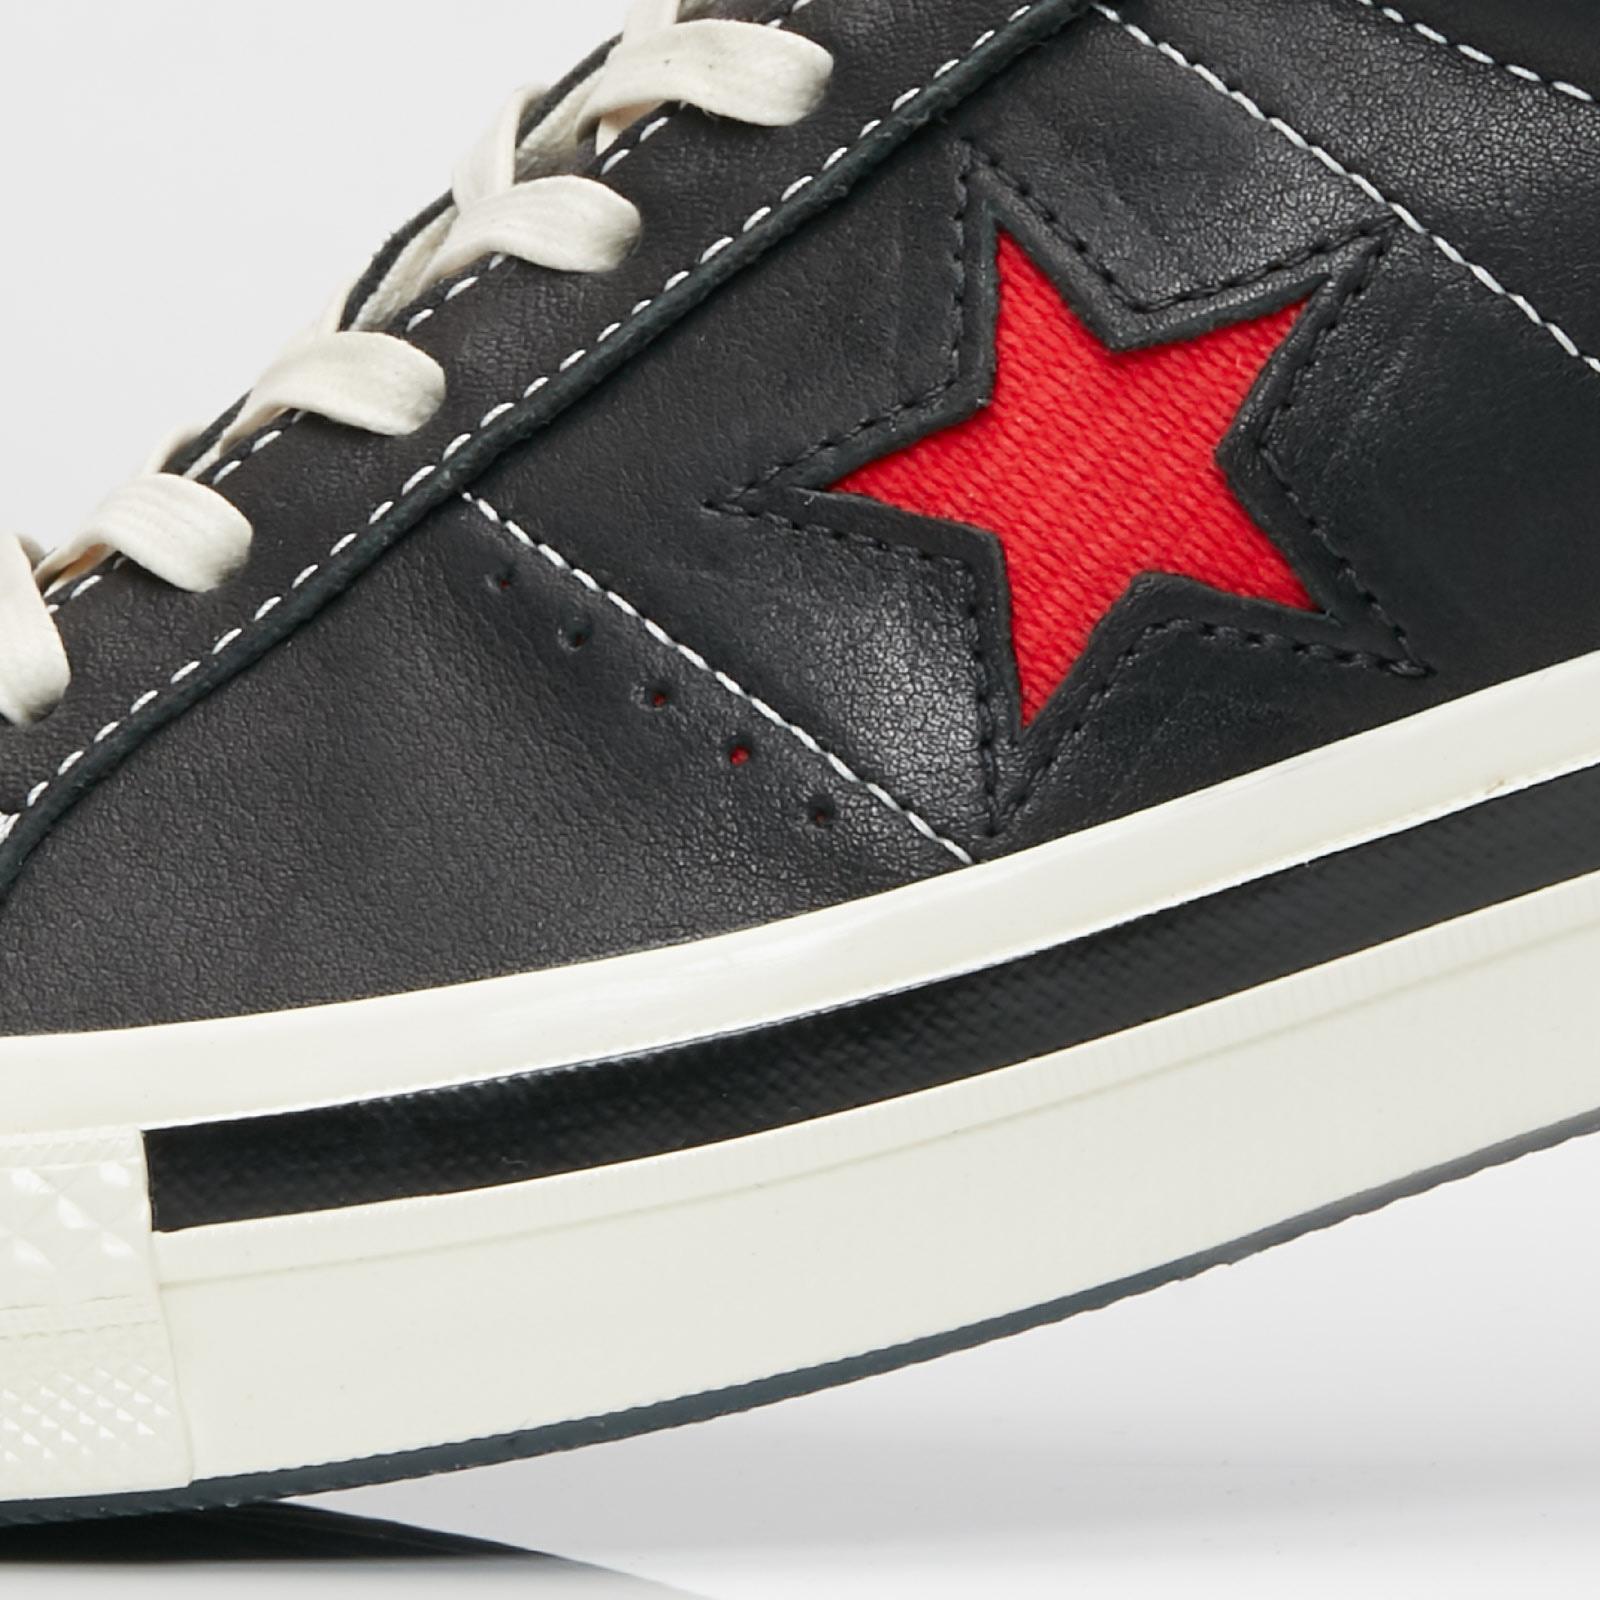 Converse One Star x Kasina - 162839c